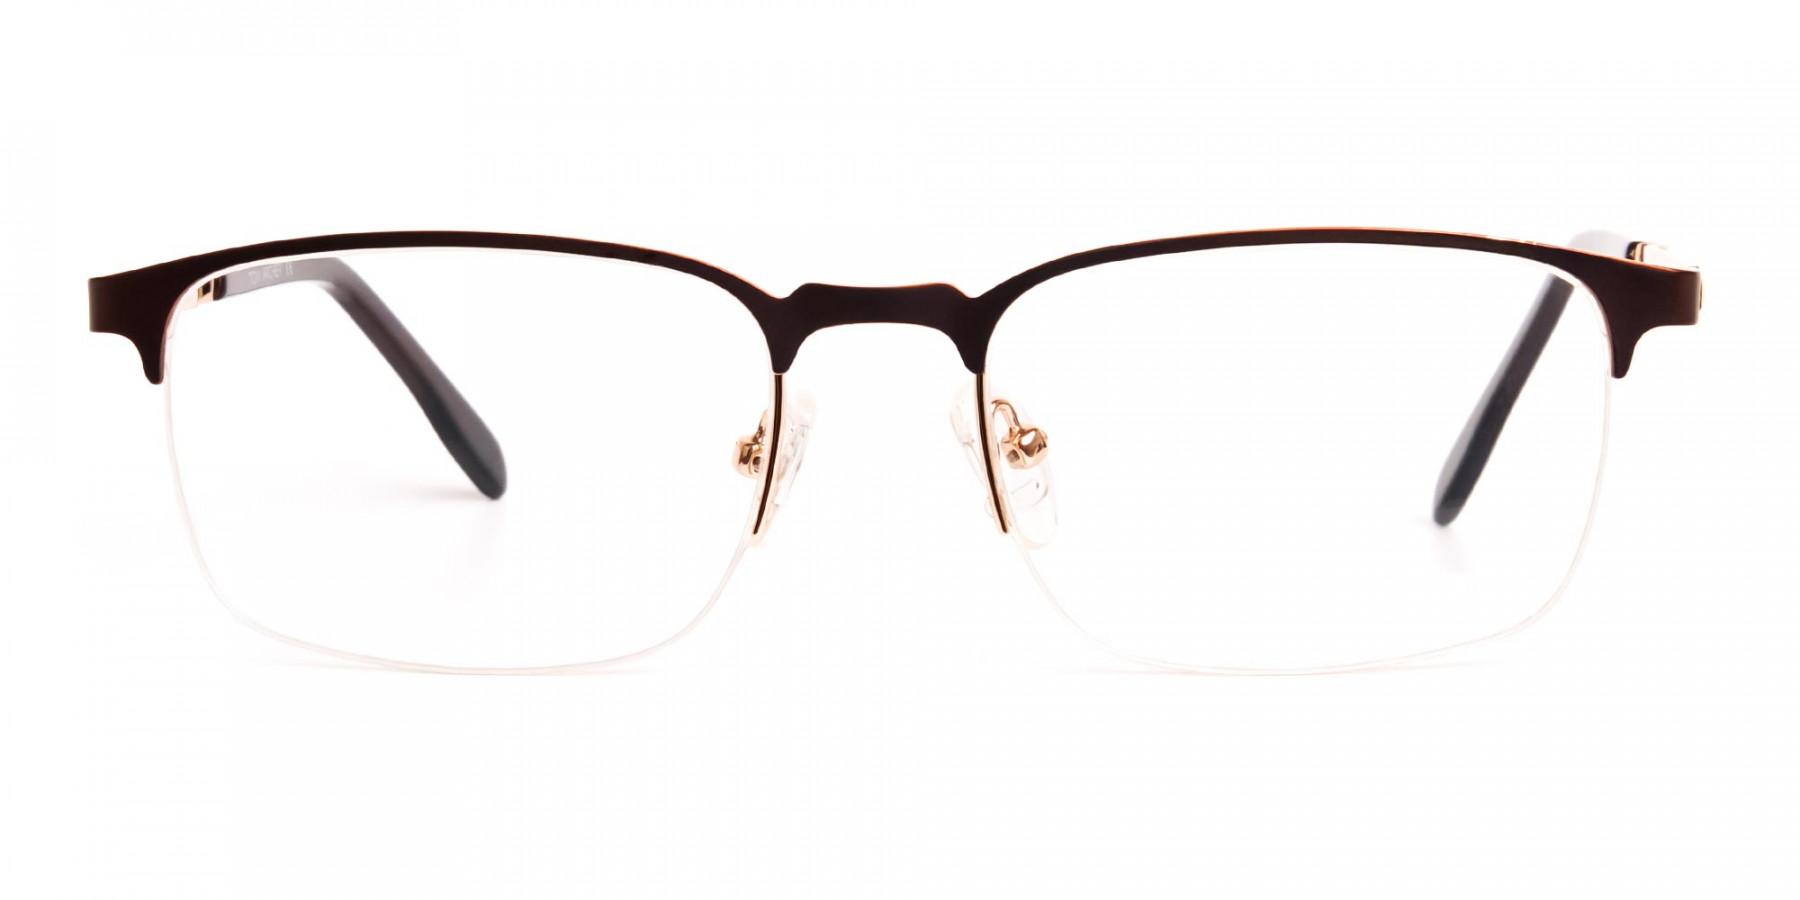 dark-brown-rectangular-half-rim-glasses-frames-1